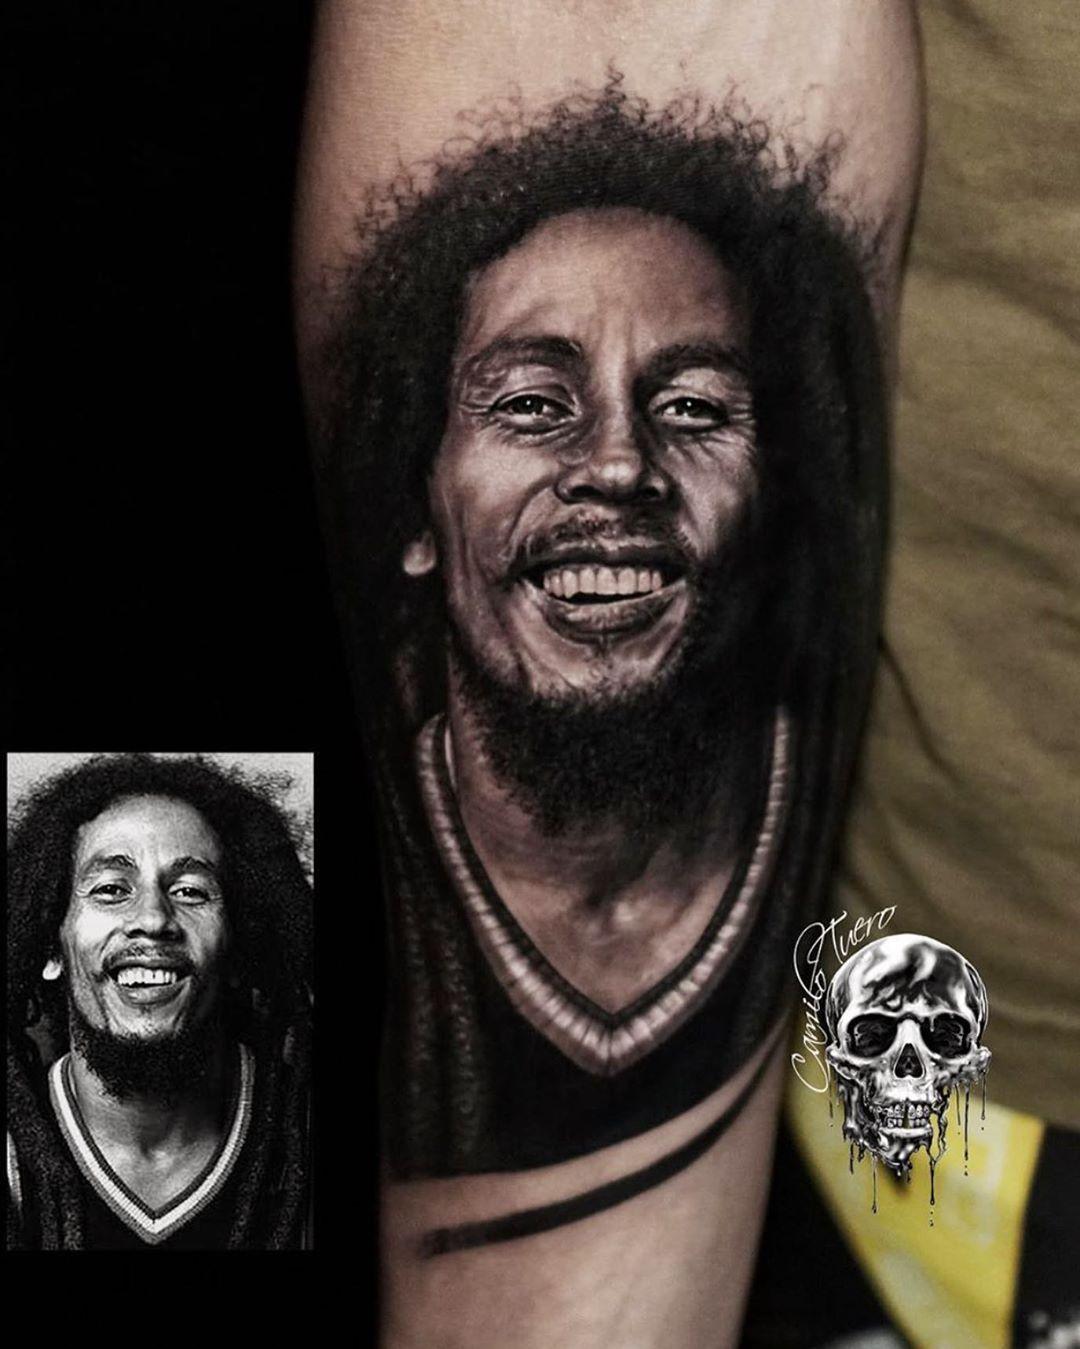 BOB MARLEY⚜️ ⚜️Orçamentos pelo WhatsApp 1194211-2626⚜️ ⚜️CADA UM TEM A TATUAGEM QUE MERECE⚜️ #bobmarley #bobmarleymusic #bobmarleyart #realismo #portrait #retrato #realistictattoo #realistictattoos #tattootealistic #camilotuero #monstershousetattoosp #bnginksociety #inksav #inkedmag #inkedmagazine #tattooinkartmagazine #tattooinkartmag #skinartmag #skinartmagazine #tattoosnob #tattoo_art_worldwide #tattoorevuemag #tattooistaragazine #thebesttattooartist #tattooartistmag #tatuagemmasculina #tatu